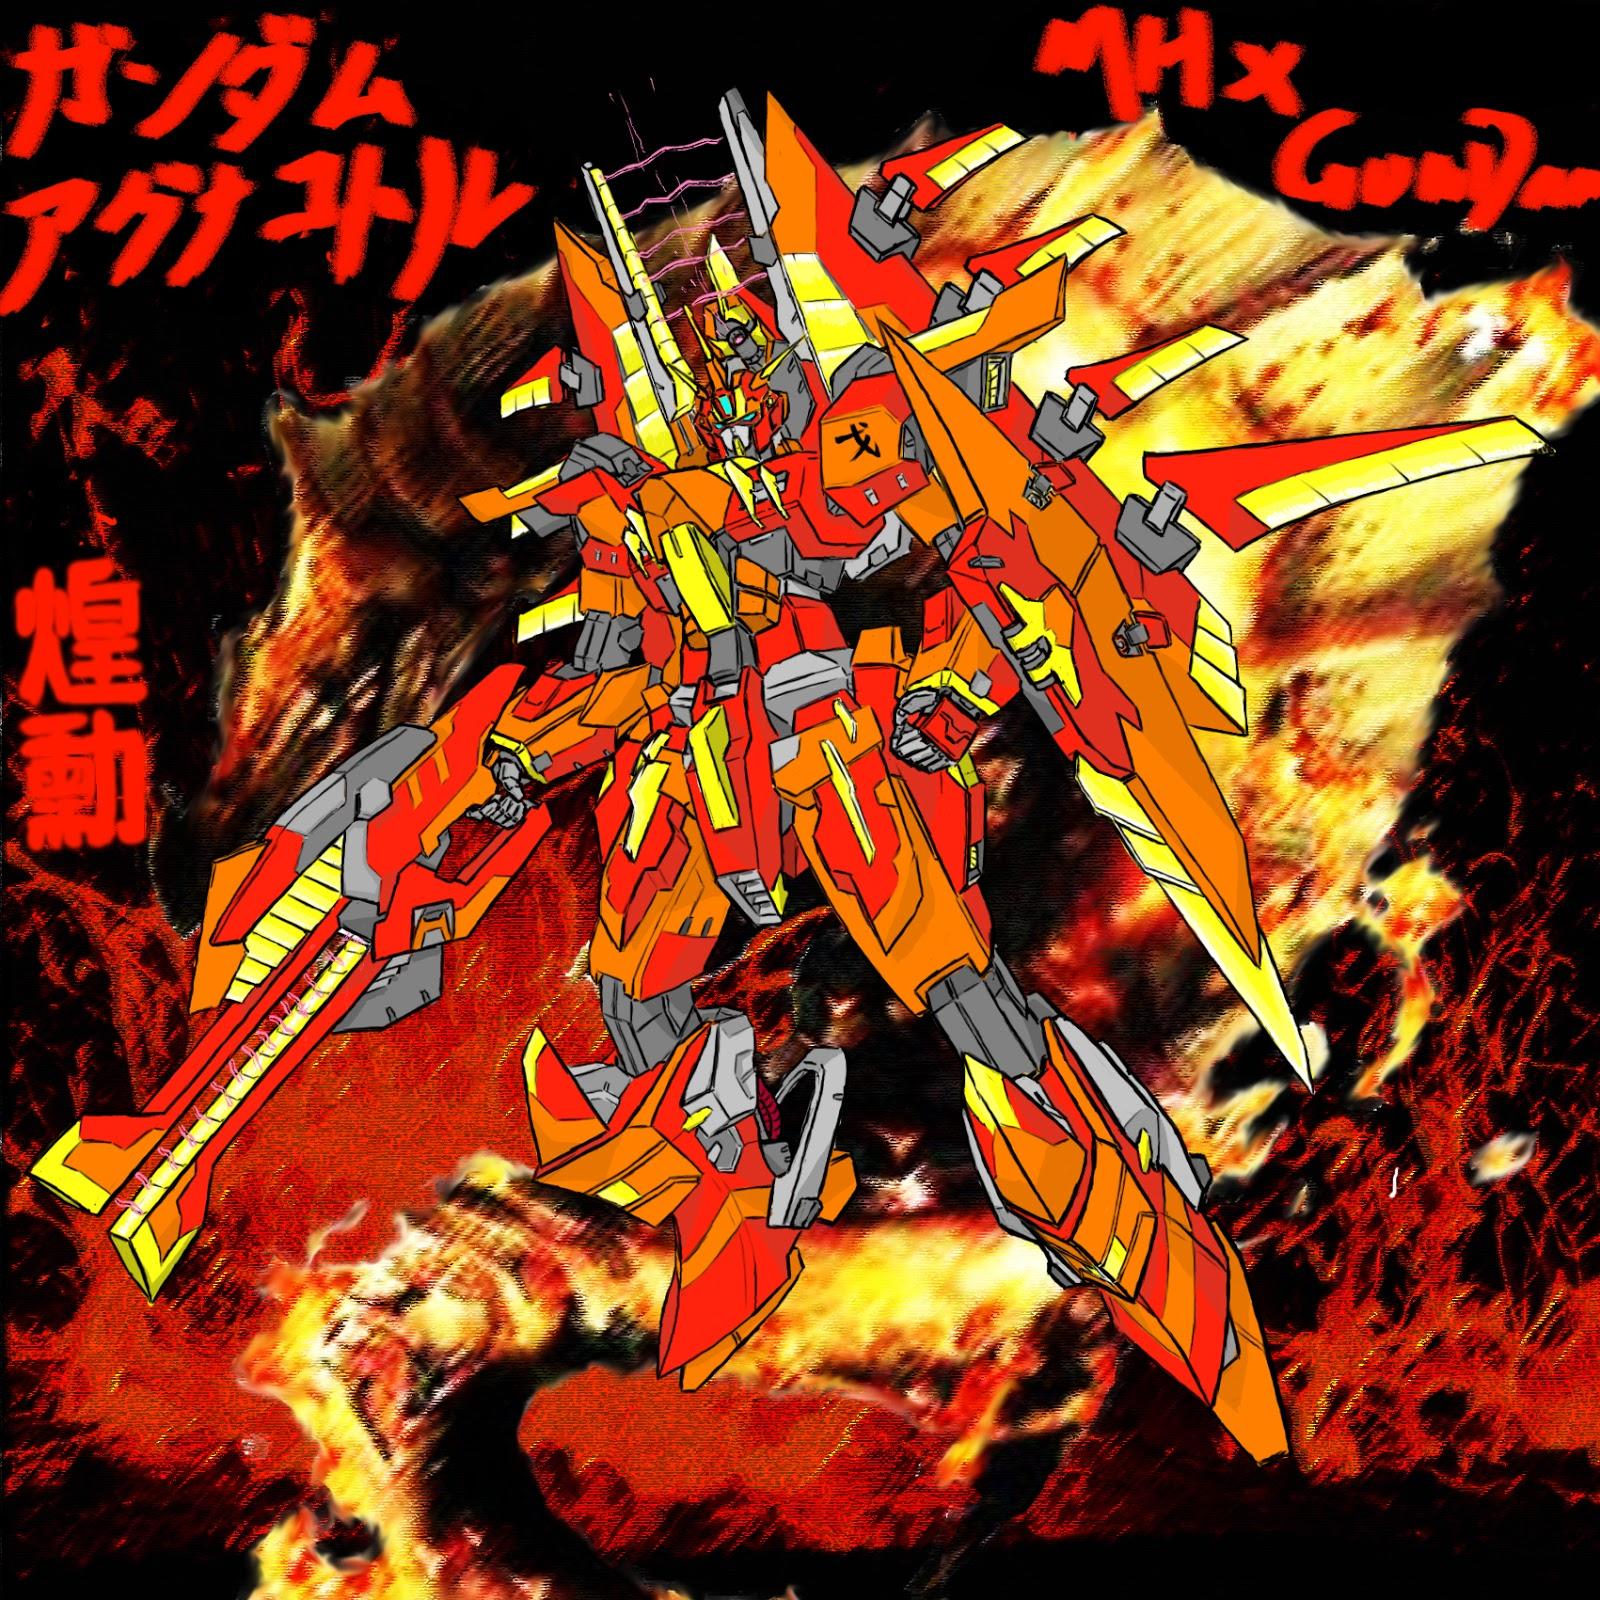 GUNDAM GUY: Monster Hunter x Gundam - Artwork by AM-Worst